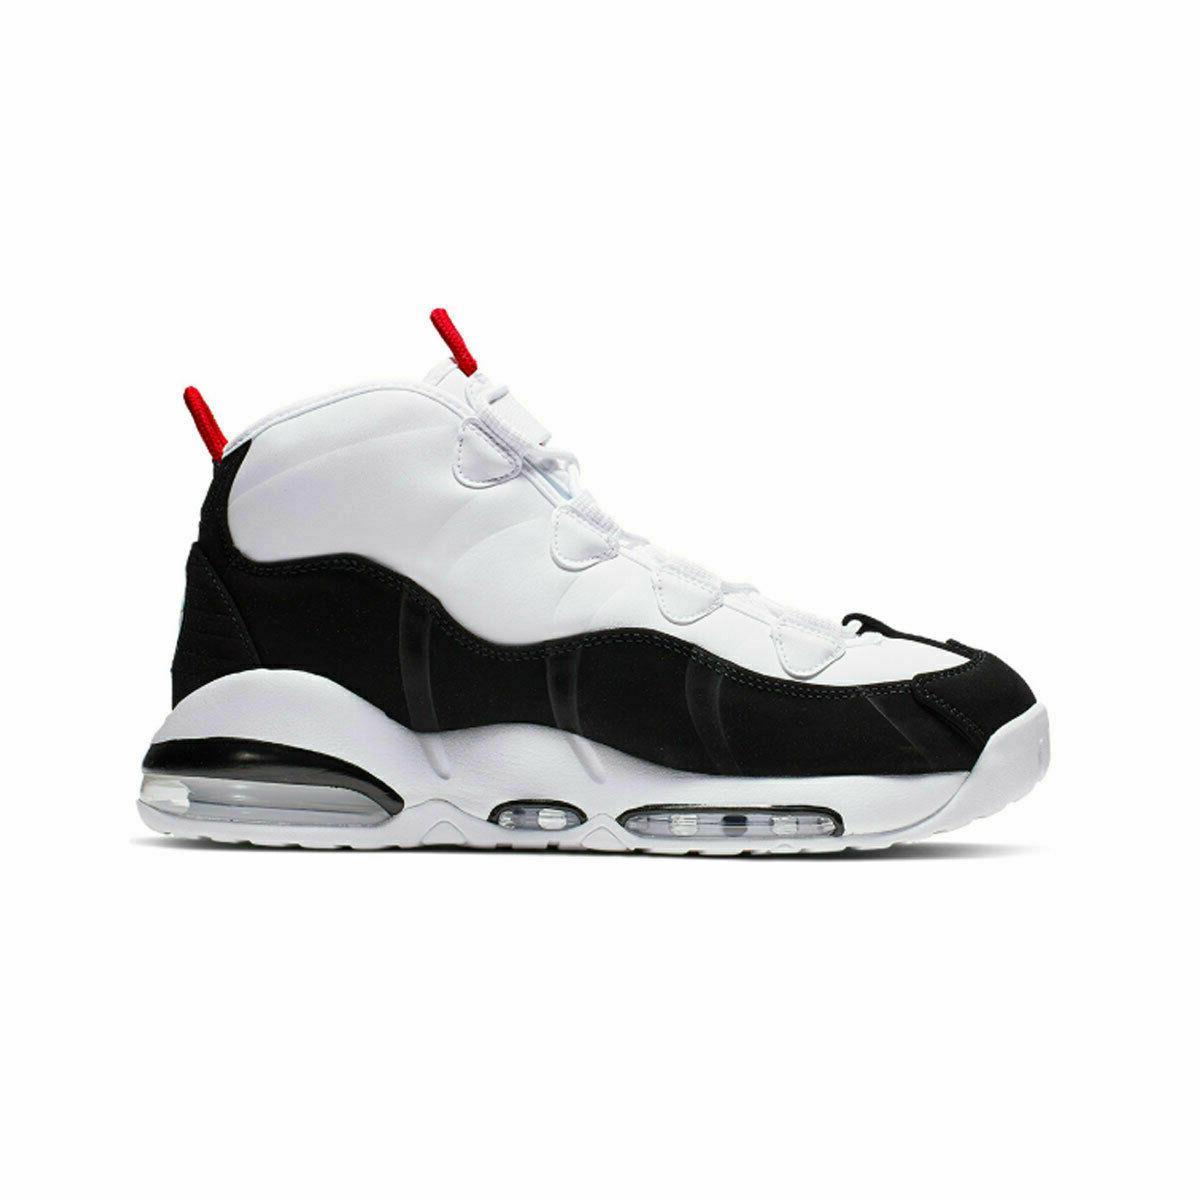 Nike '95 CK0892 101 White Black